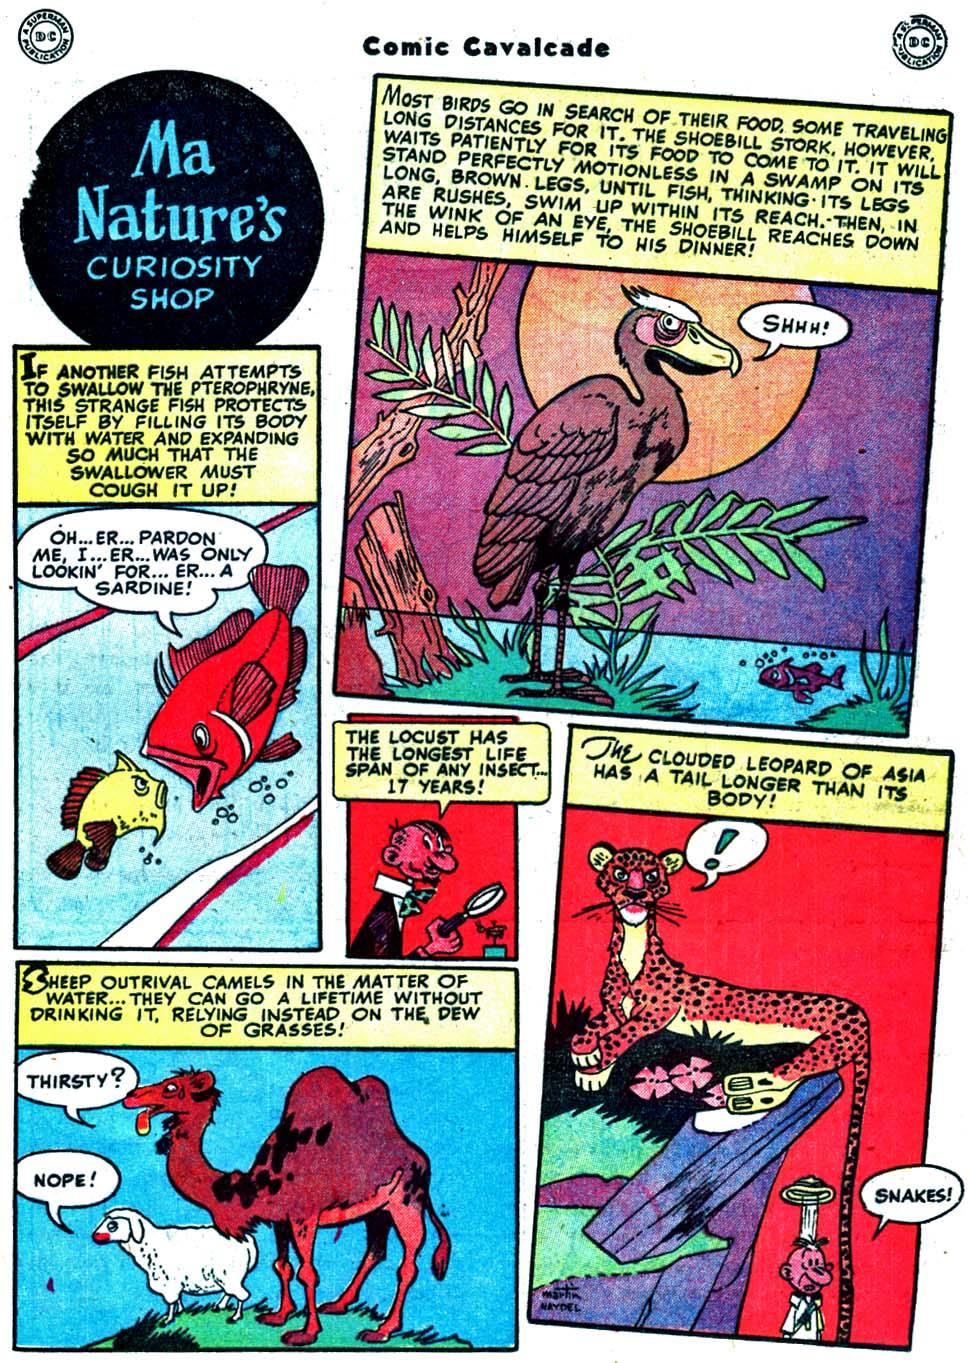 Comic Cavalcade issue 32 - Page 65